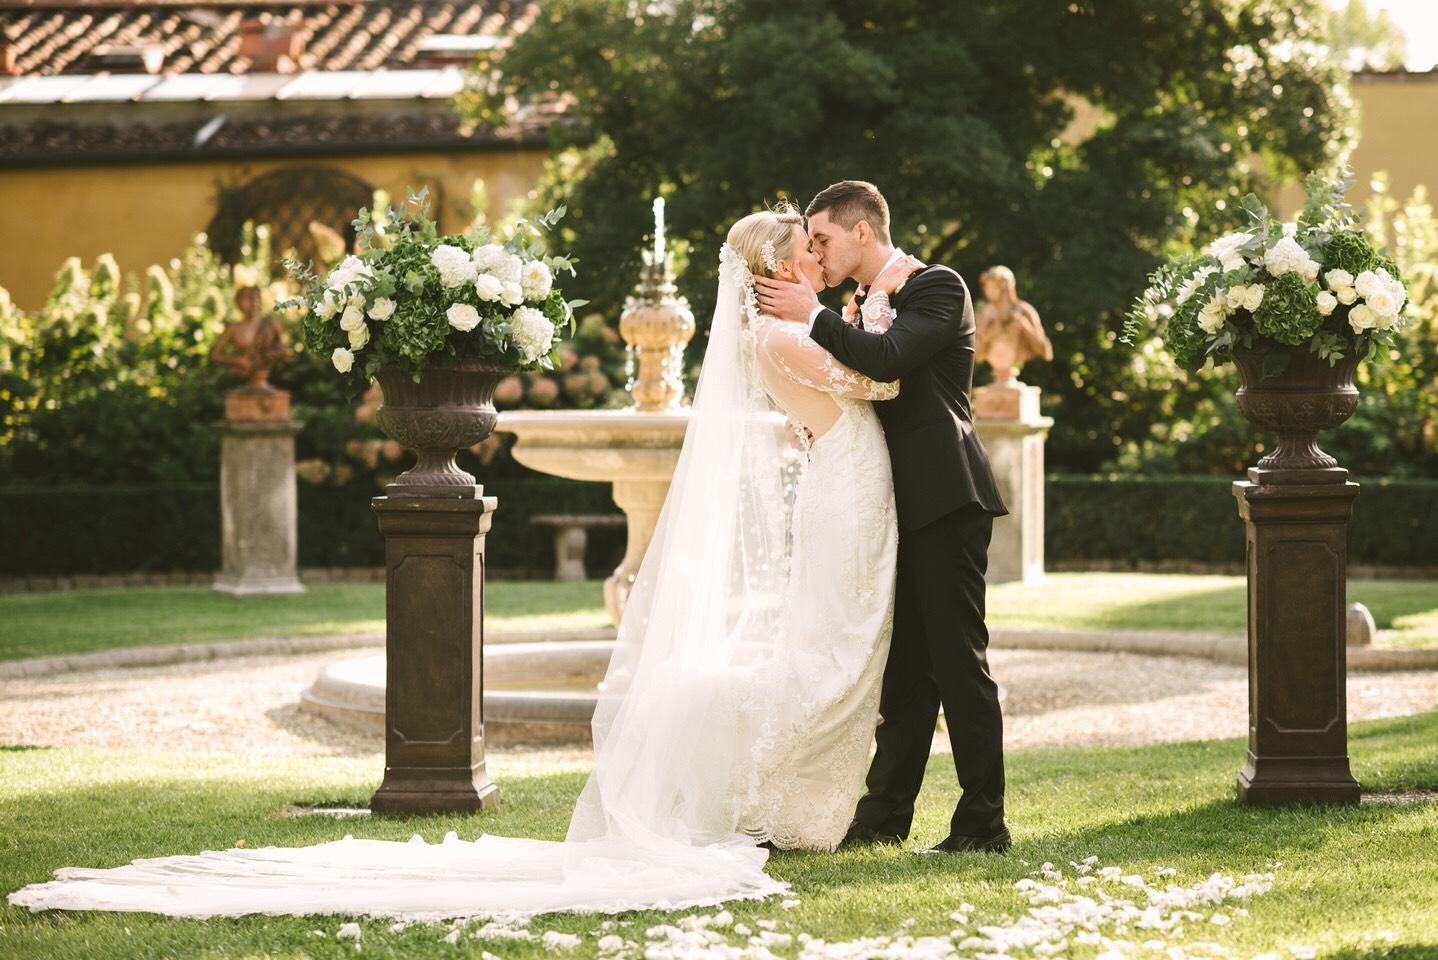 wedding-ceremony-flowers-tuscany